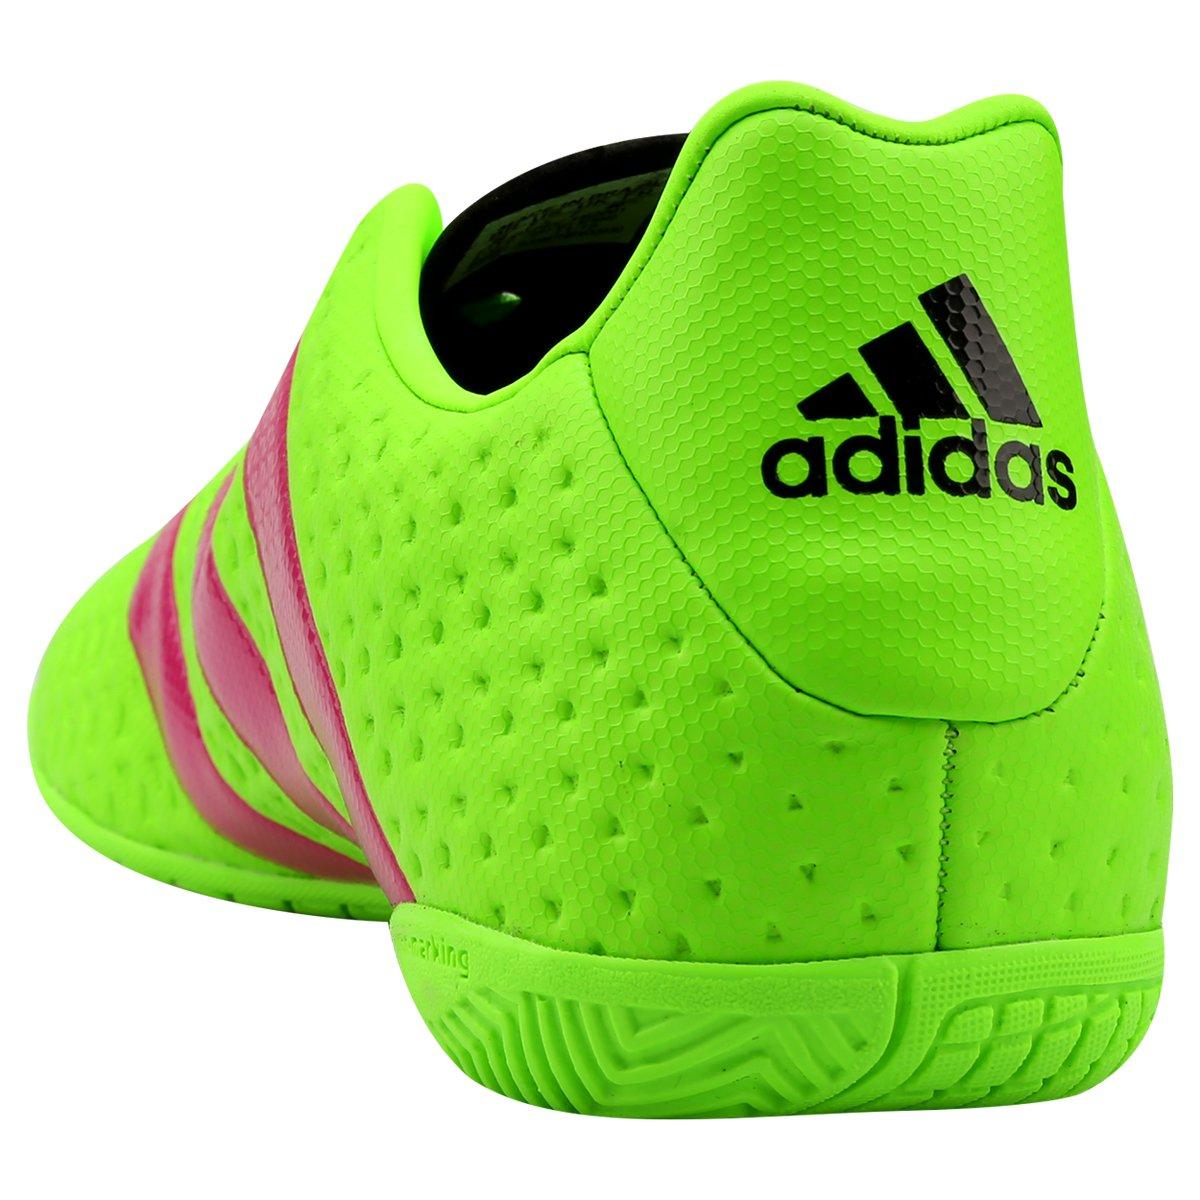 Chuteira Futsal Adidas Ace 16.4 IN - Verde Limão e Pink - Compre ... 17718971b17b3